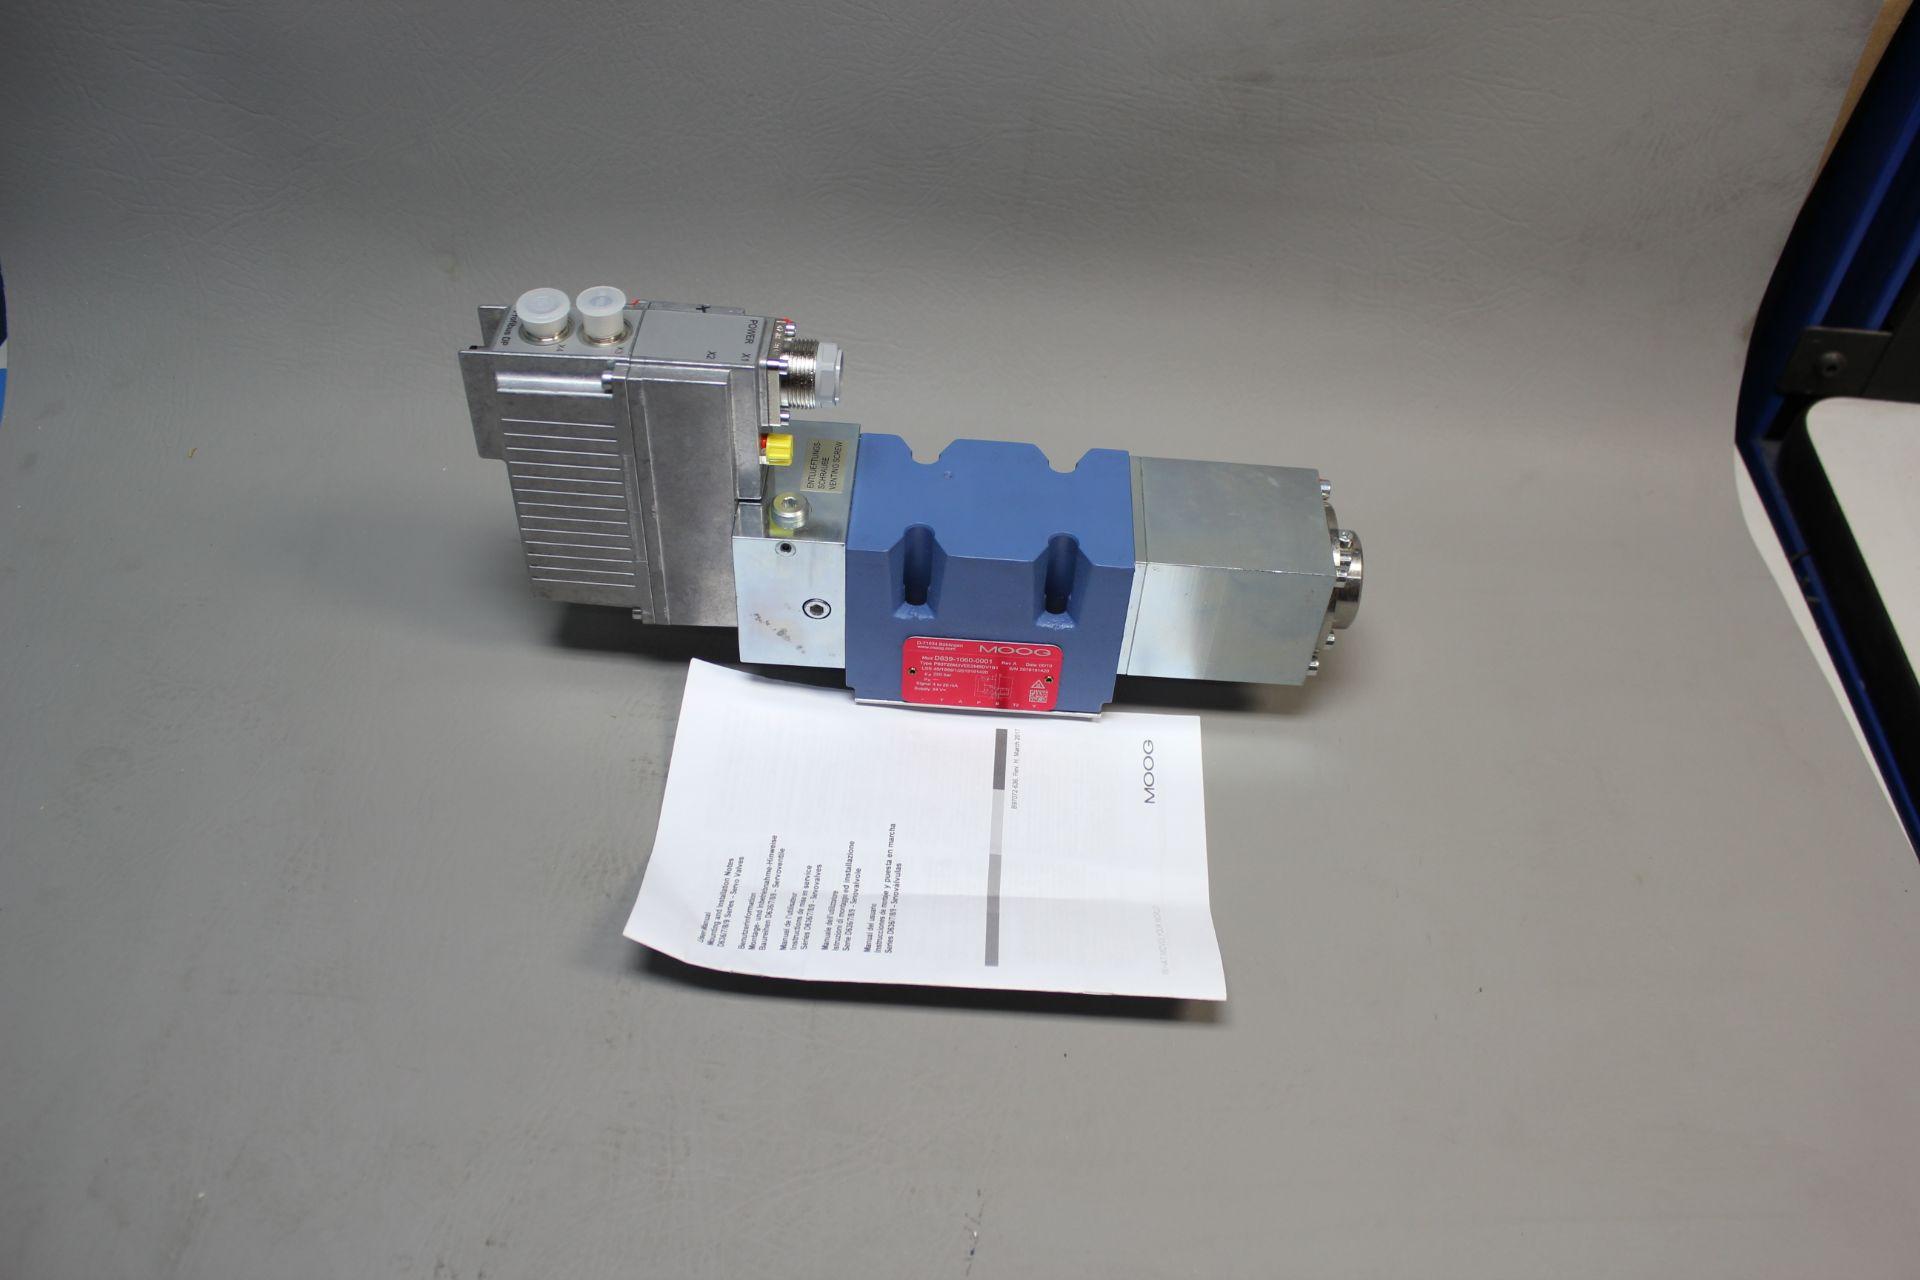 NEW MOOG DIRECT DRIVE DIGITAL CONTROL HYDRAULIC SERVO VALVE - Image 4 of 14